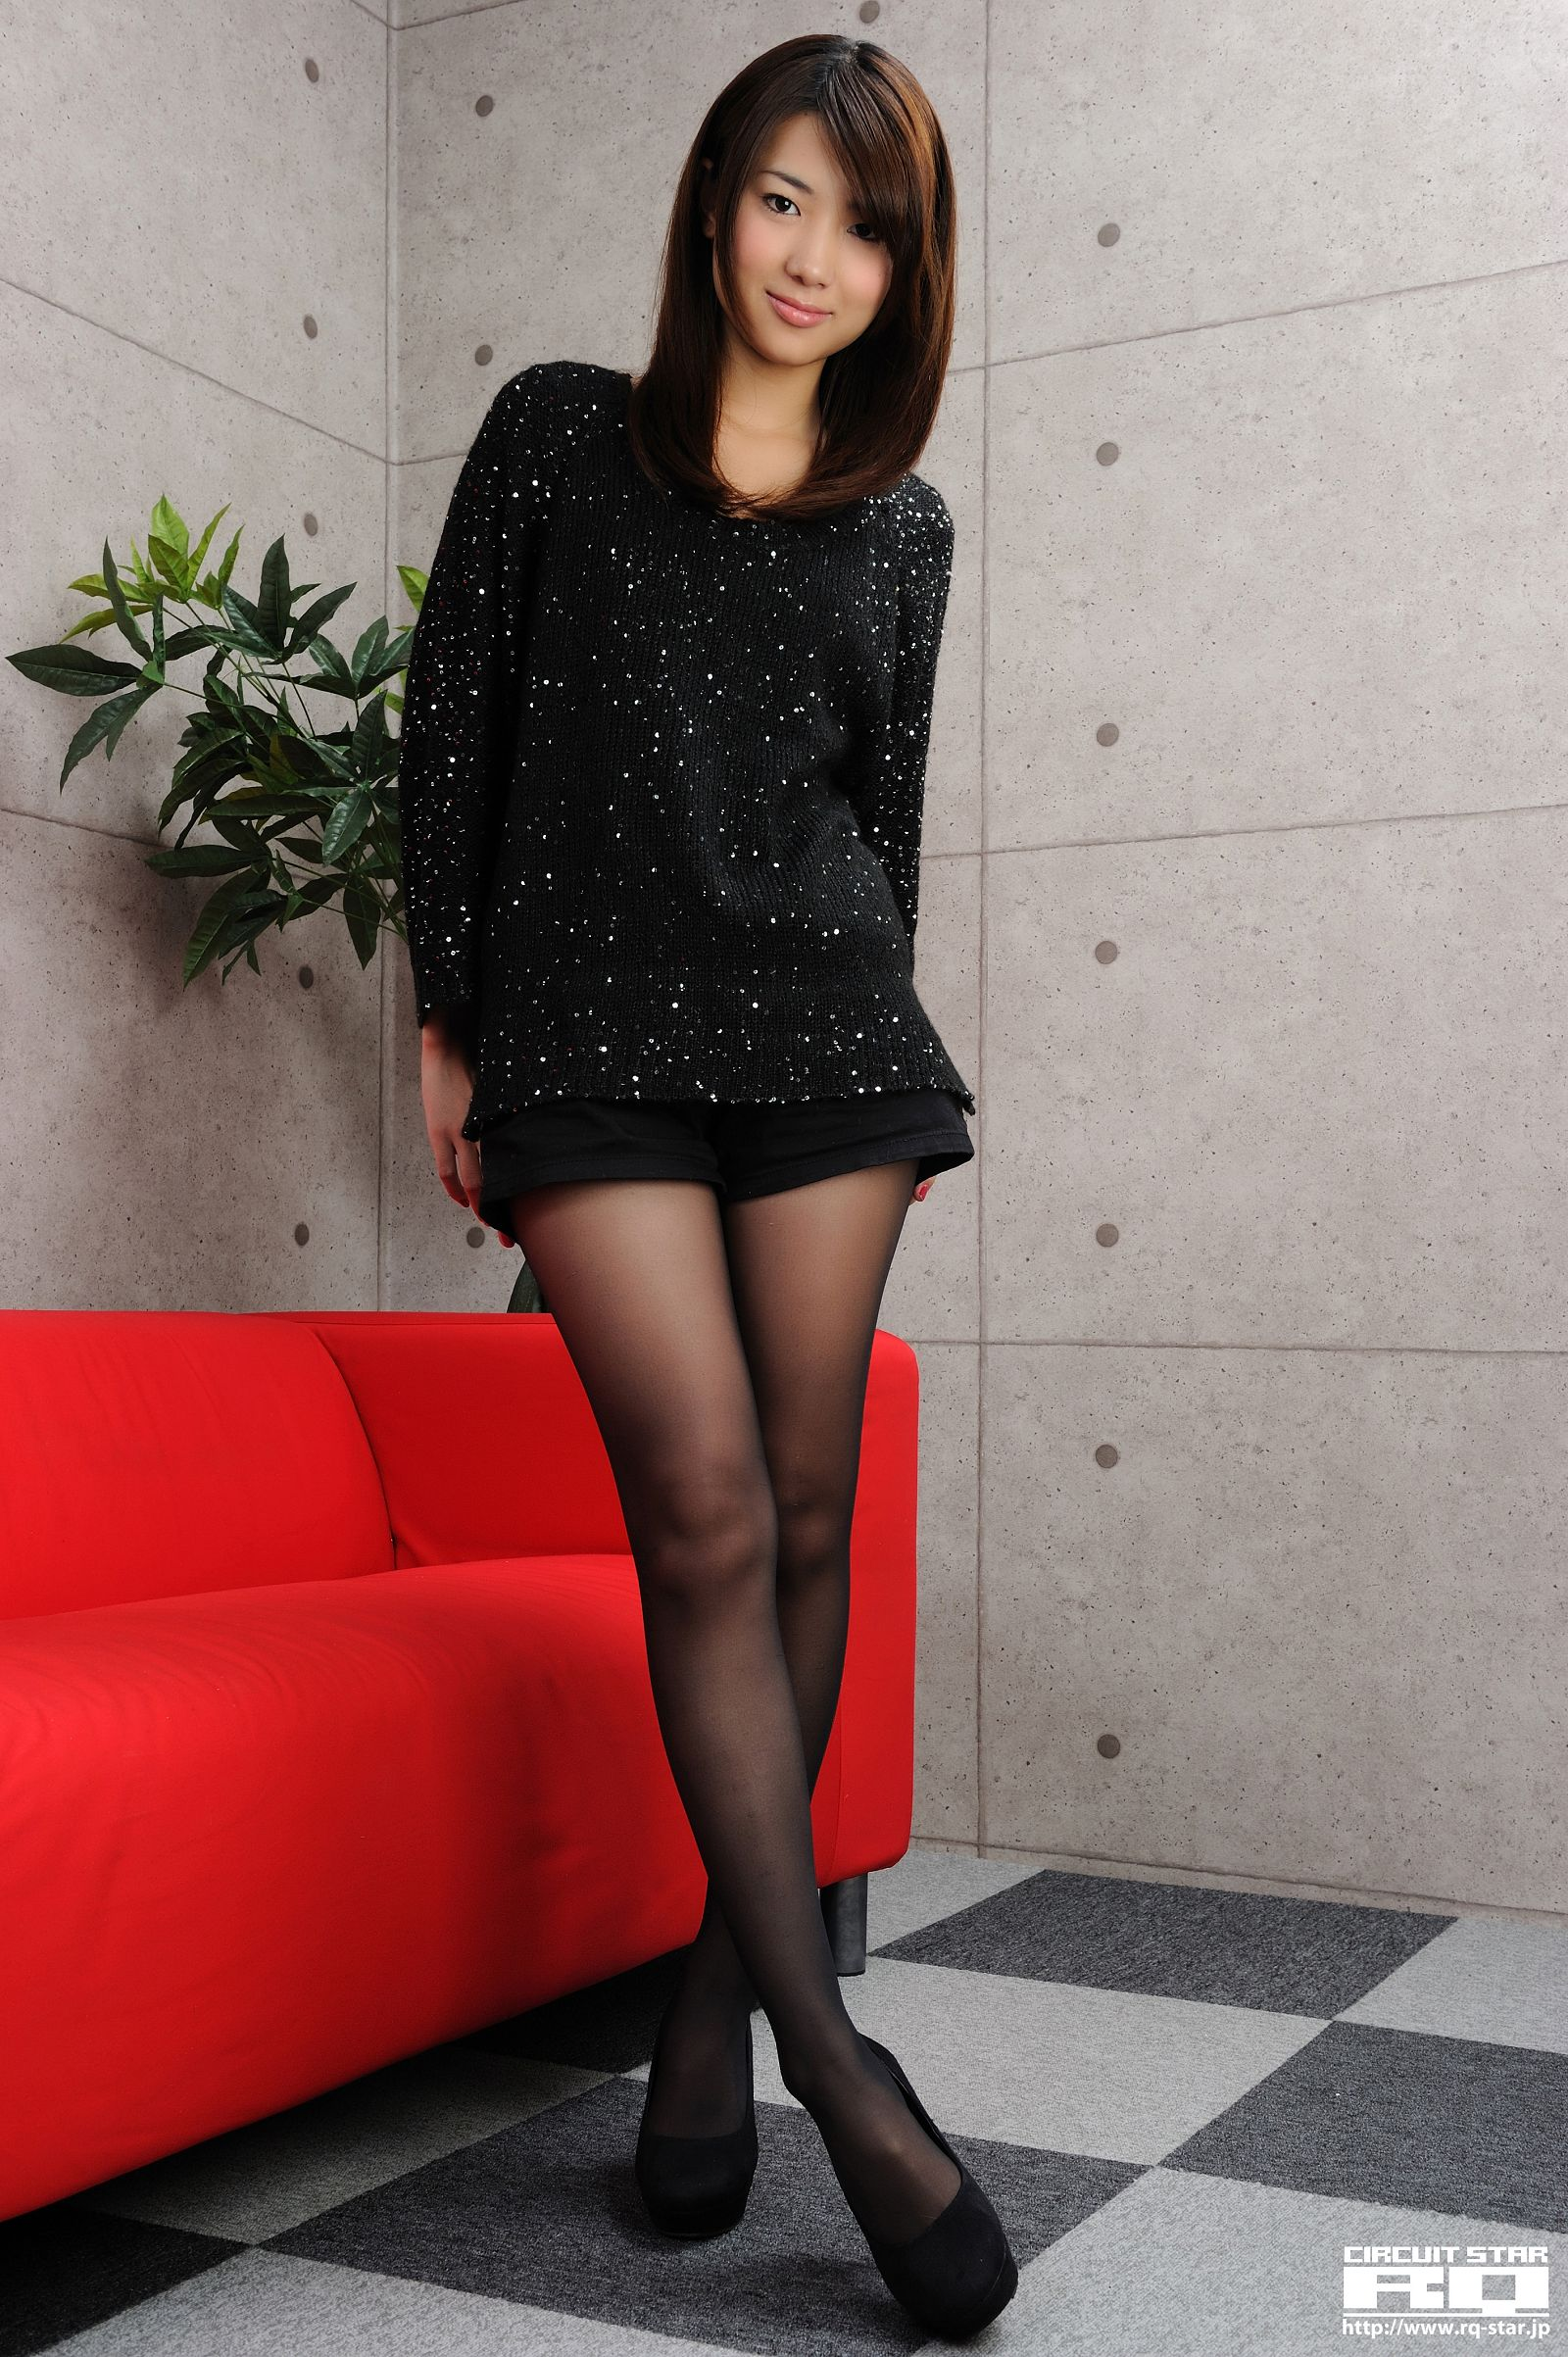 [RQ STAR美女] NO.00577 Naoho Ichihashi 市橋直歩 Private Dress[55P] RQ STAR 第1张